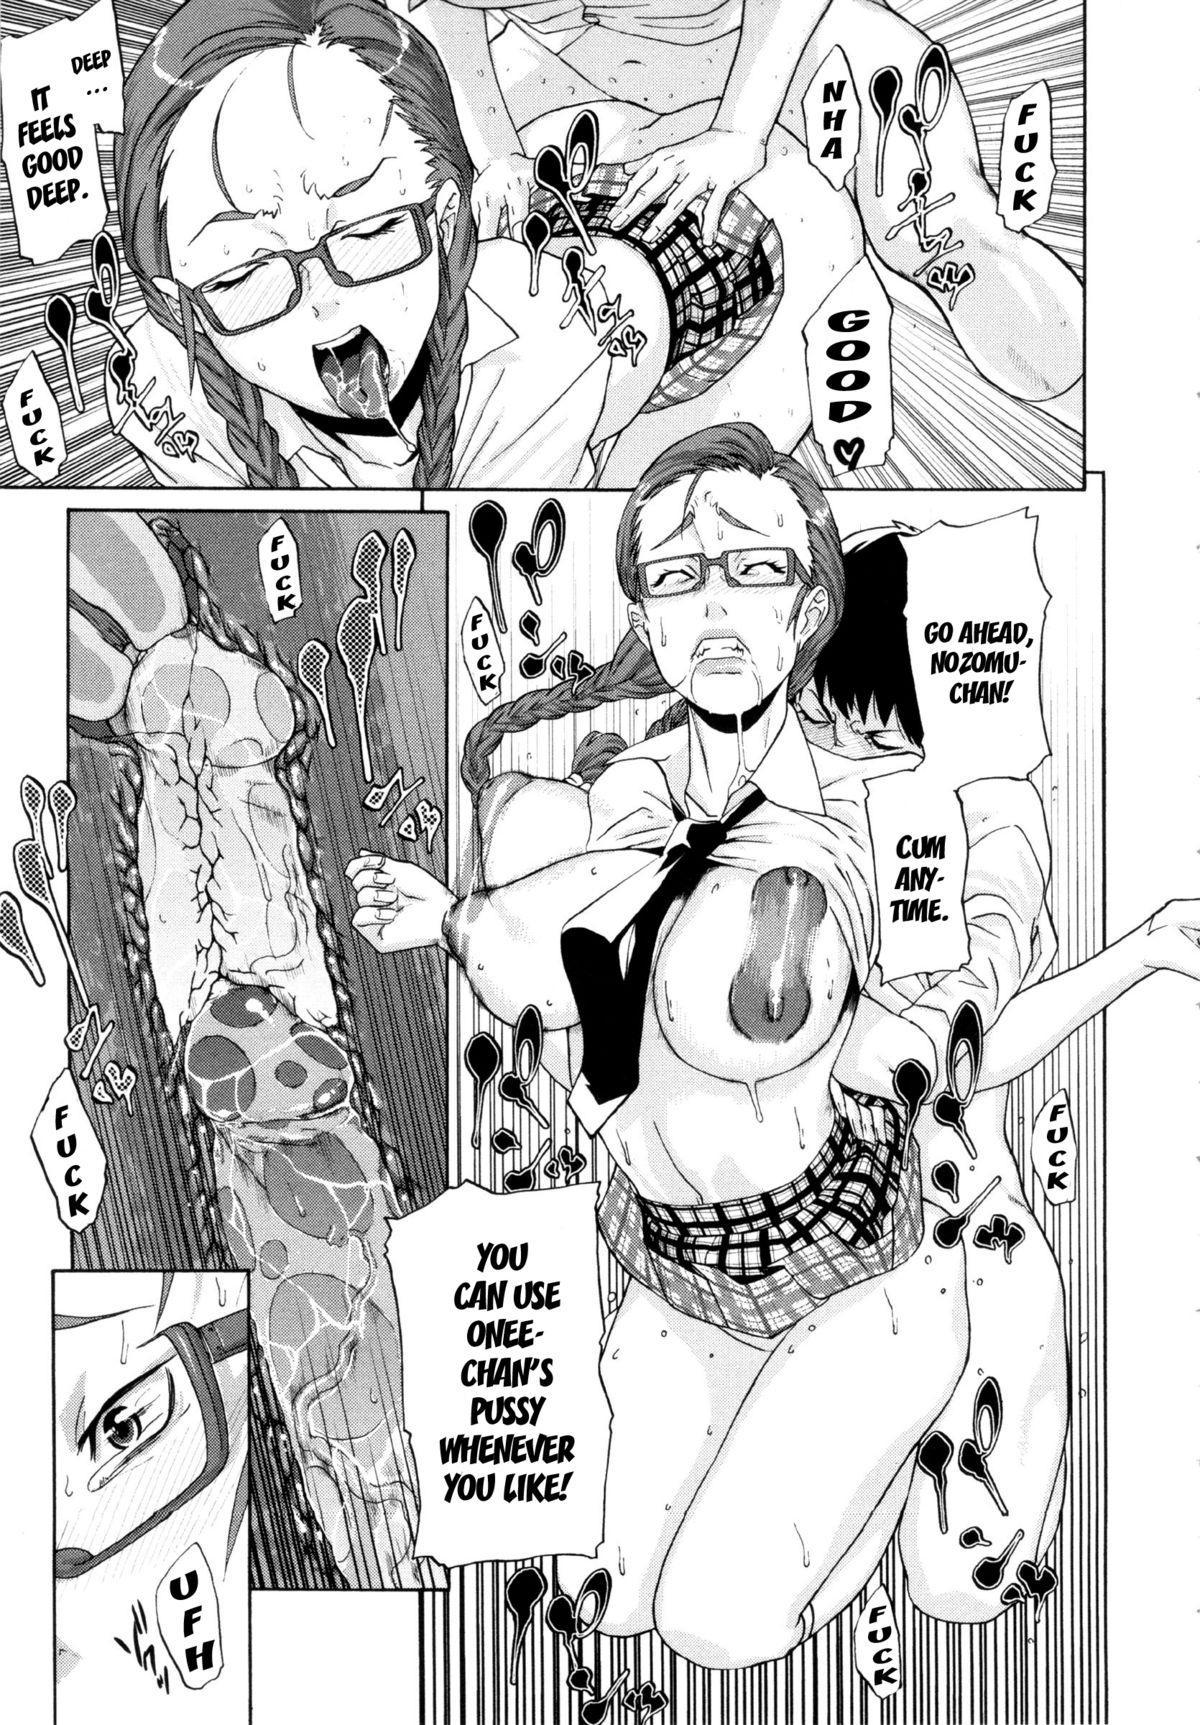 [Royal Koyanagi] Orgy Treasure Mansion GOLD Ch. 9 - 10  -  Nozomu Triangle & Orgy Showroom (Tank Version) [English] [Decensored] 6